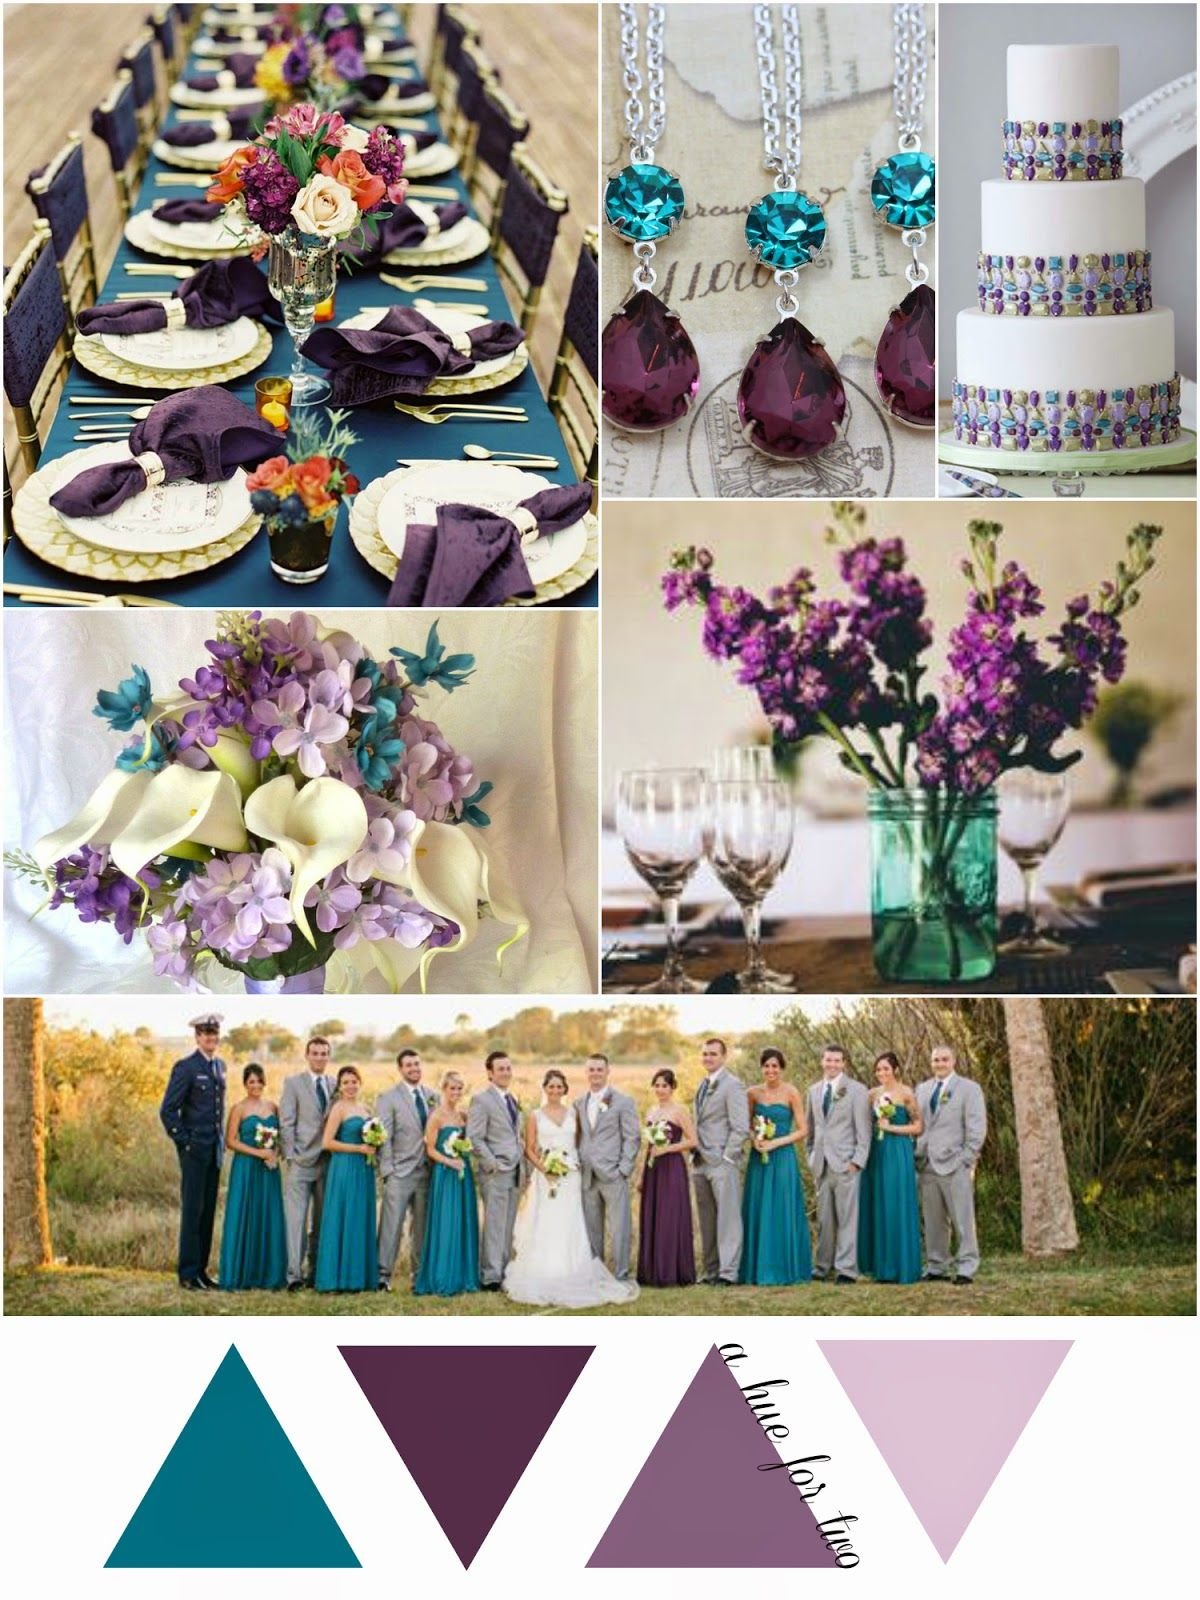 Teal, Eggplant and Lavender Wedding Colors Wedding